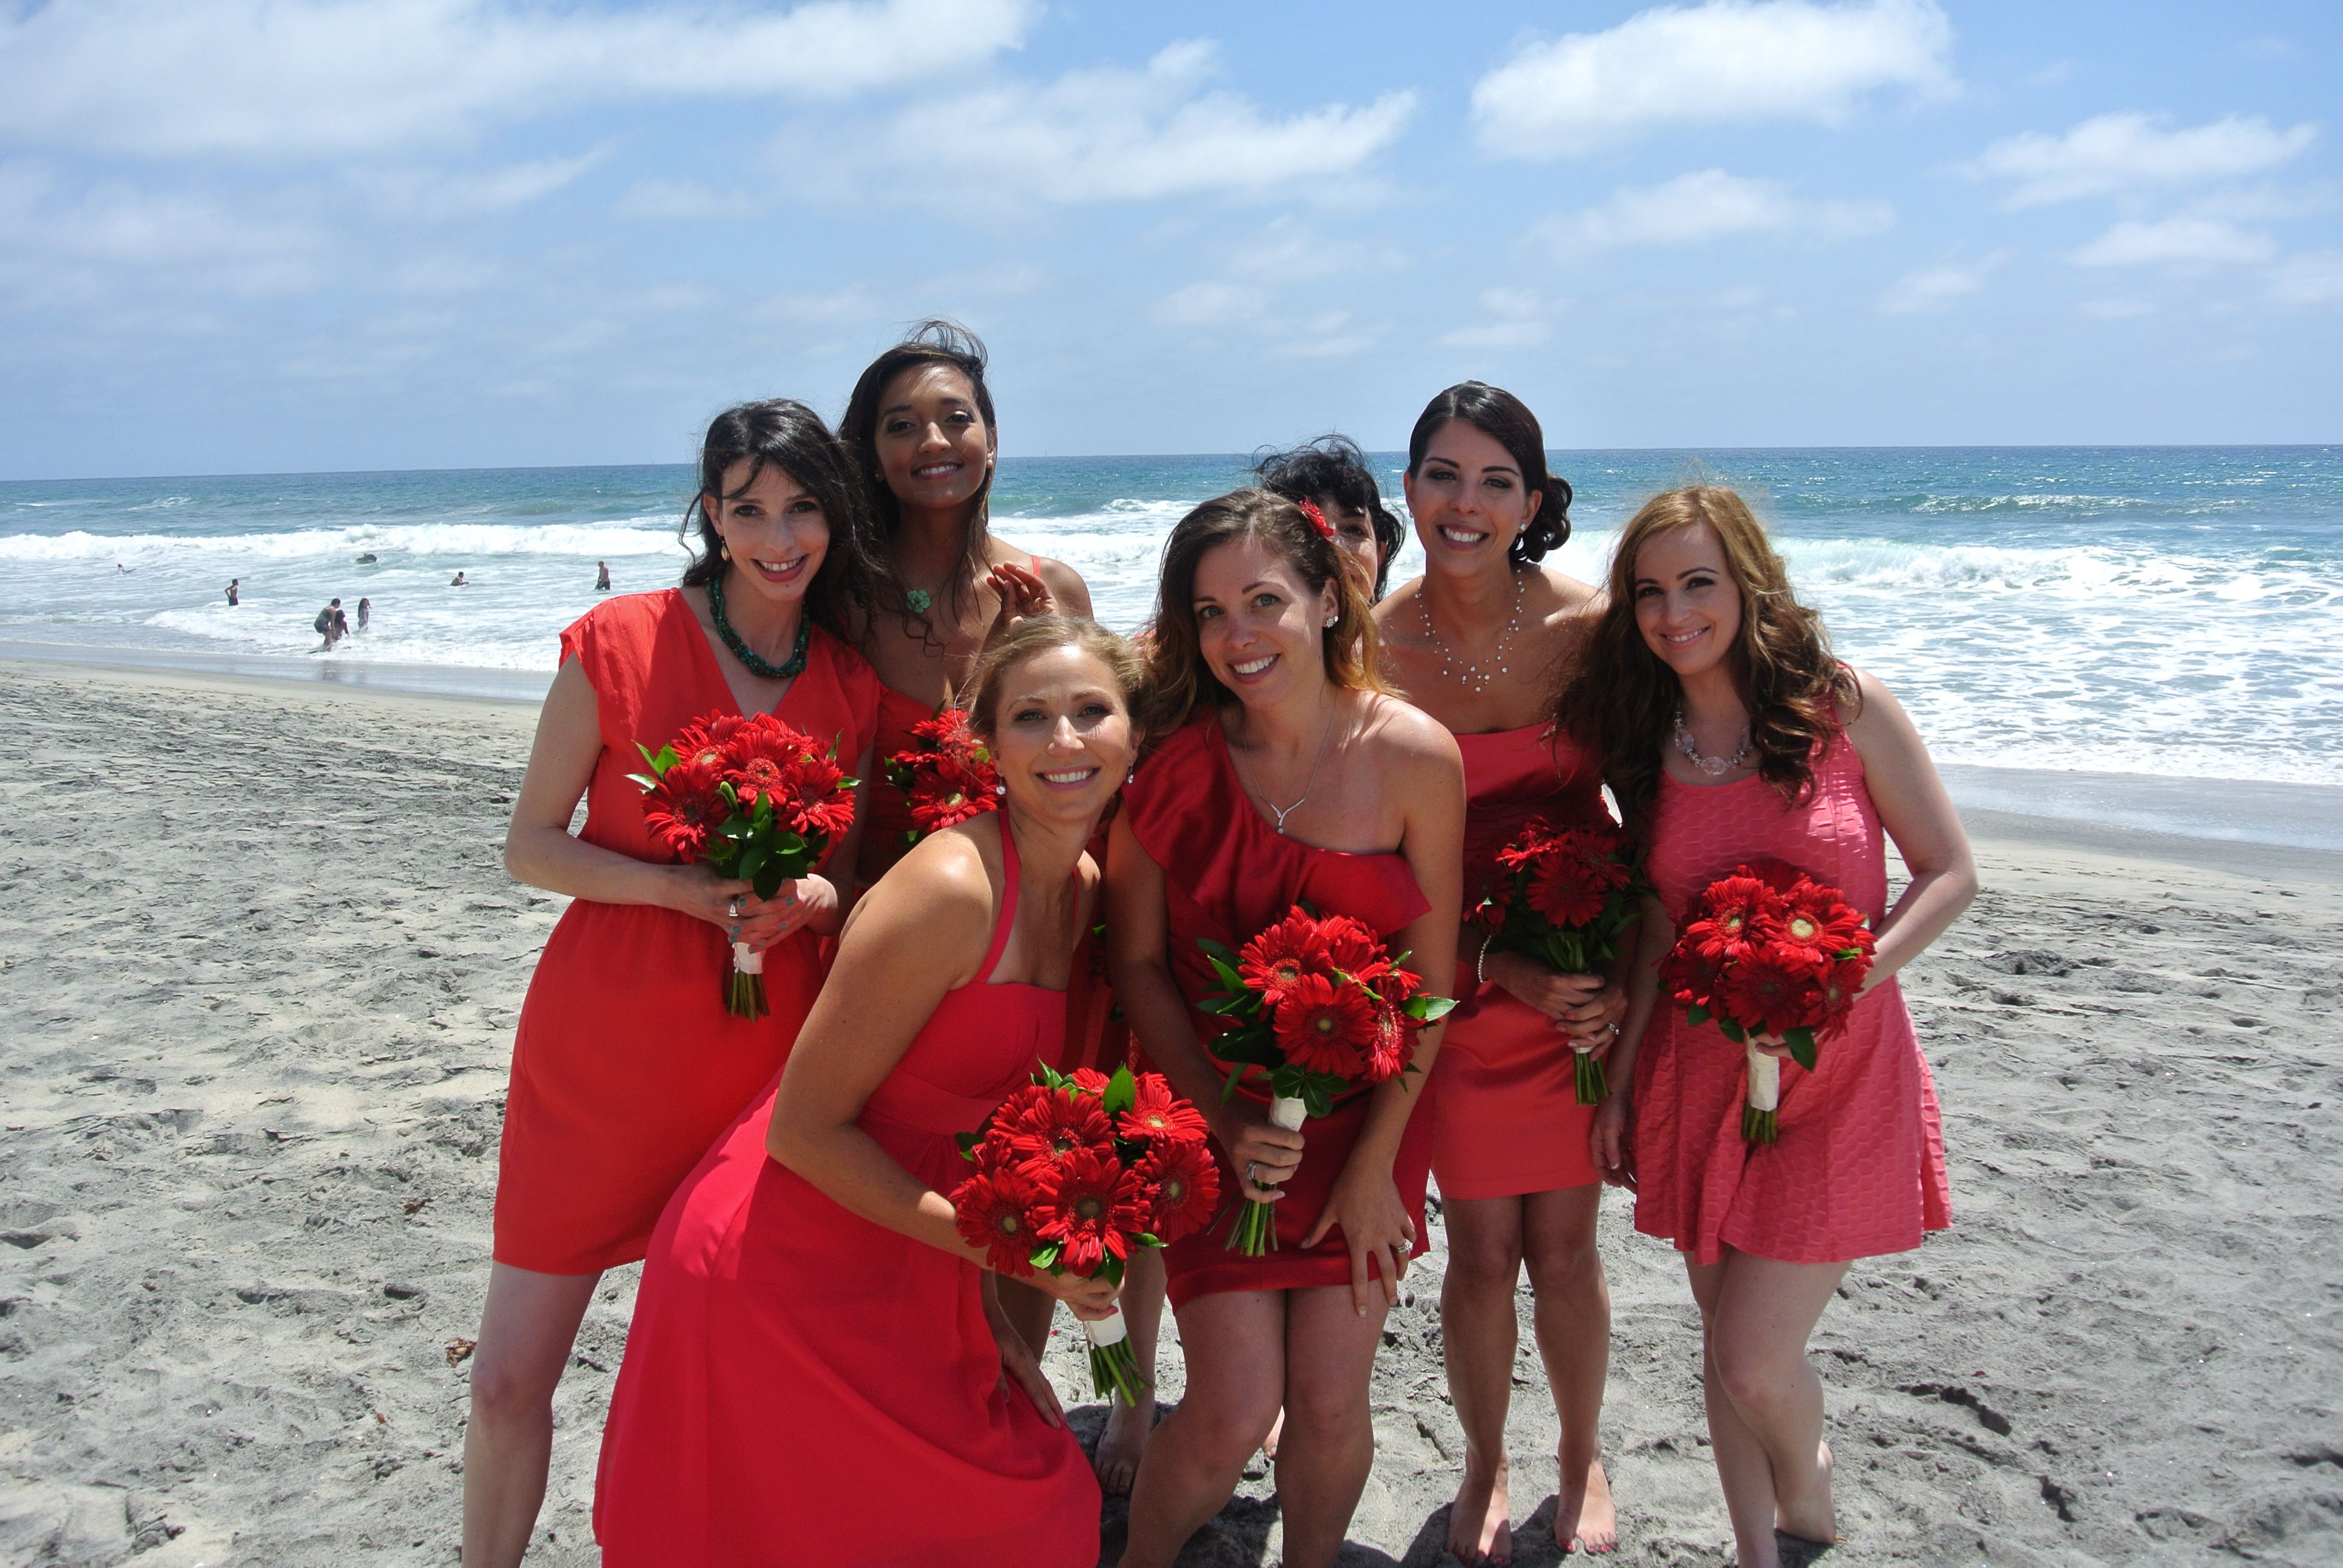 San Diego Beach Wedding, Bridesmaids dresses beachfront wedding San Diego 760 722-1866